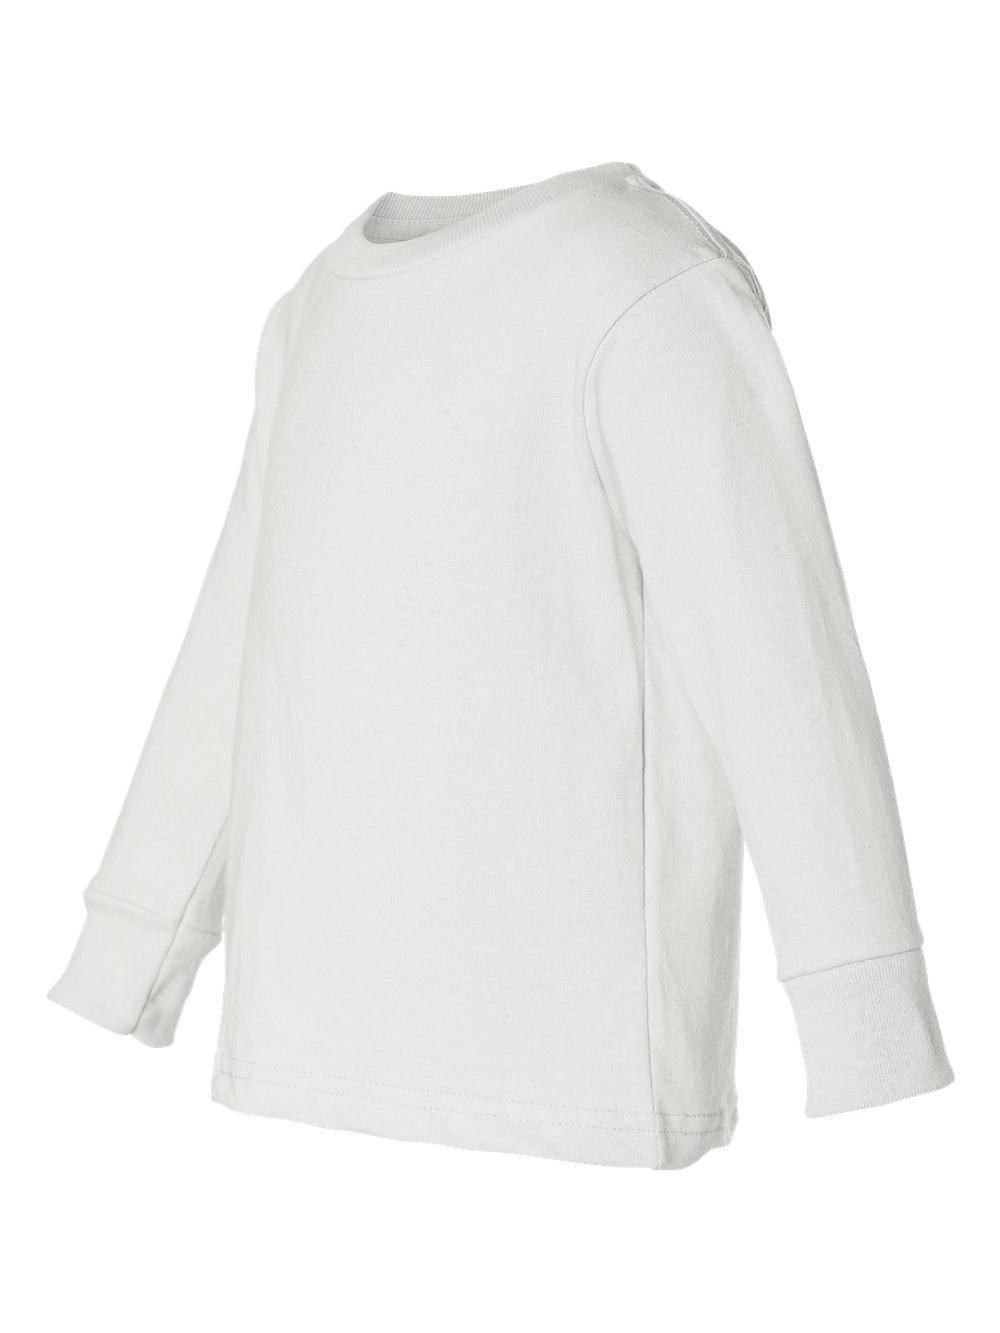 Rabbit Skins 3311 T-Shirt Toddler 5.5 oz Long-Sleeve